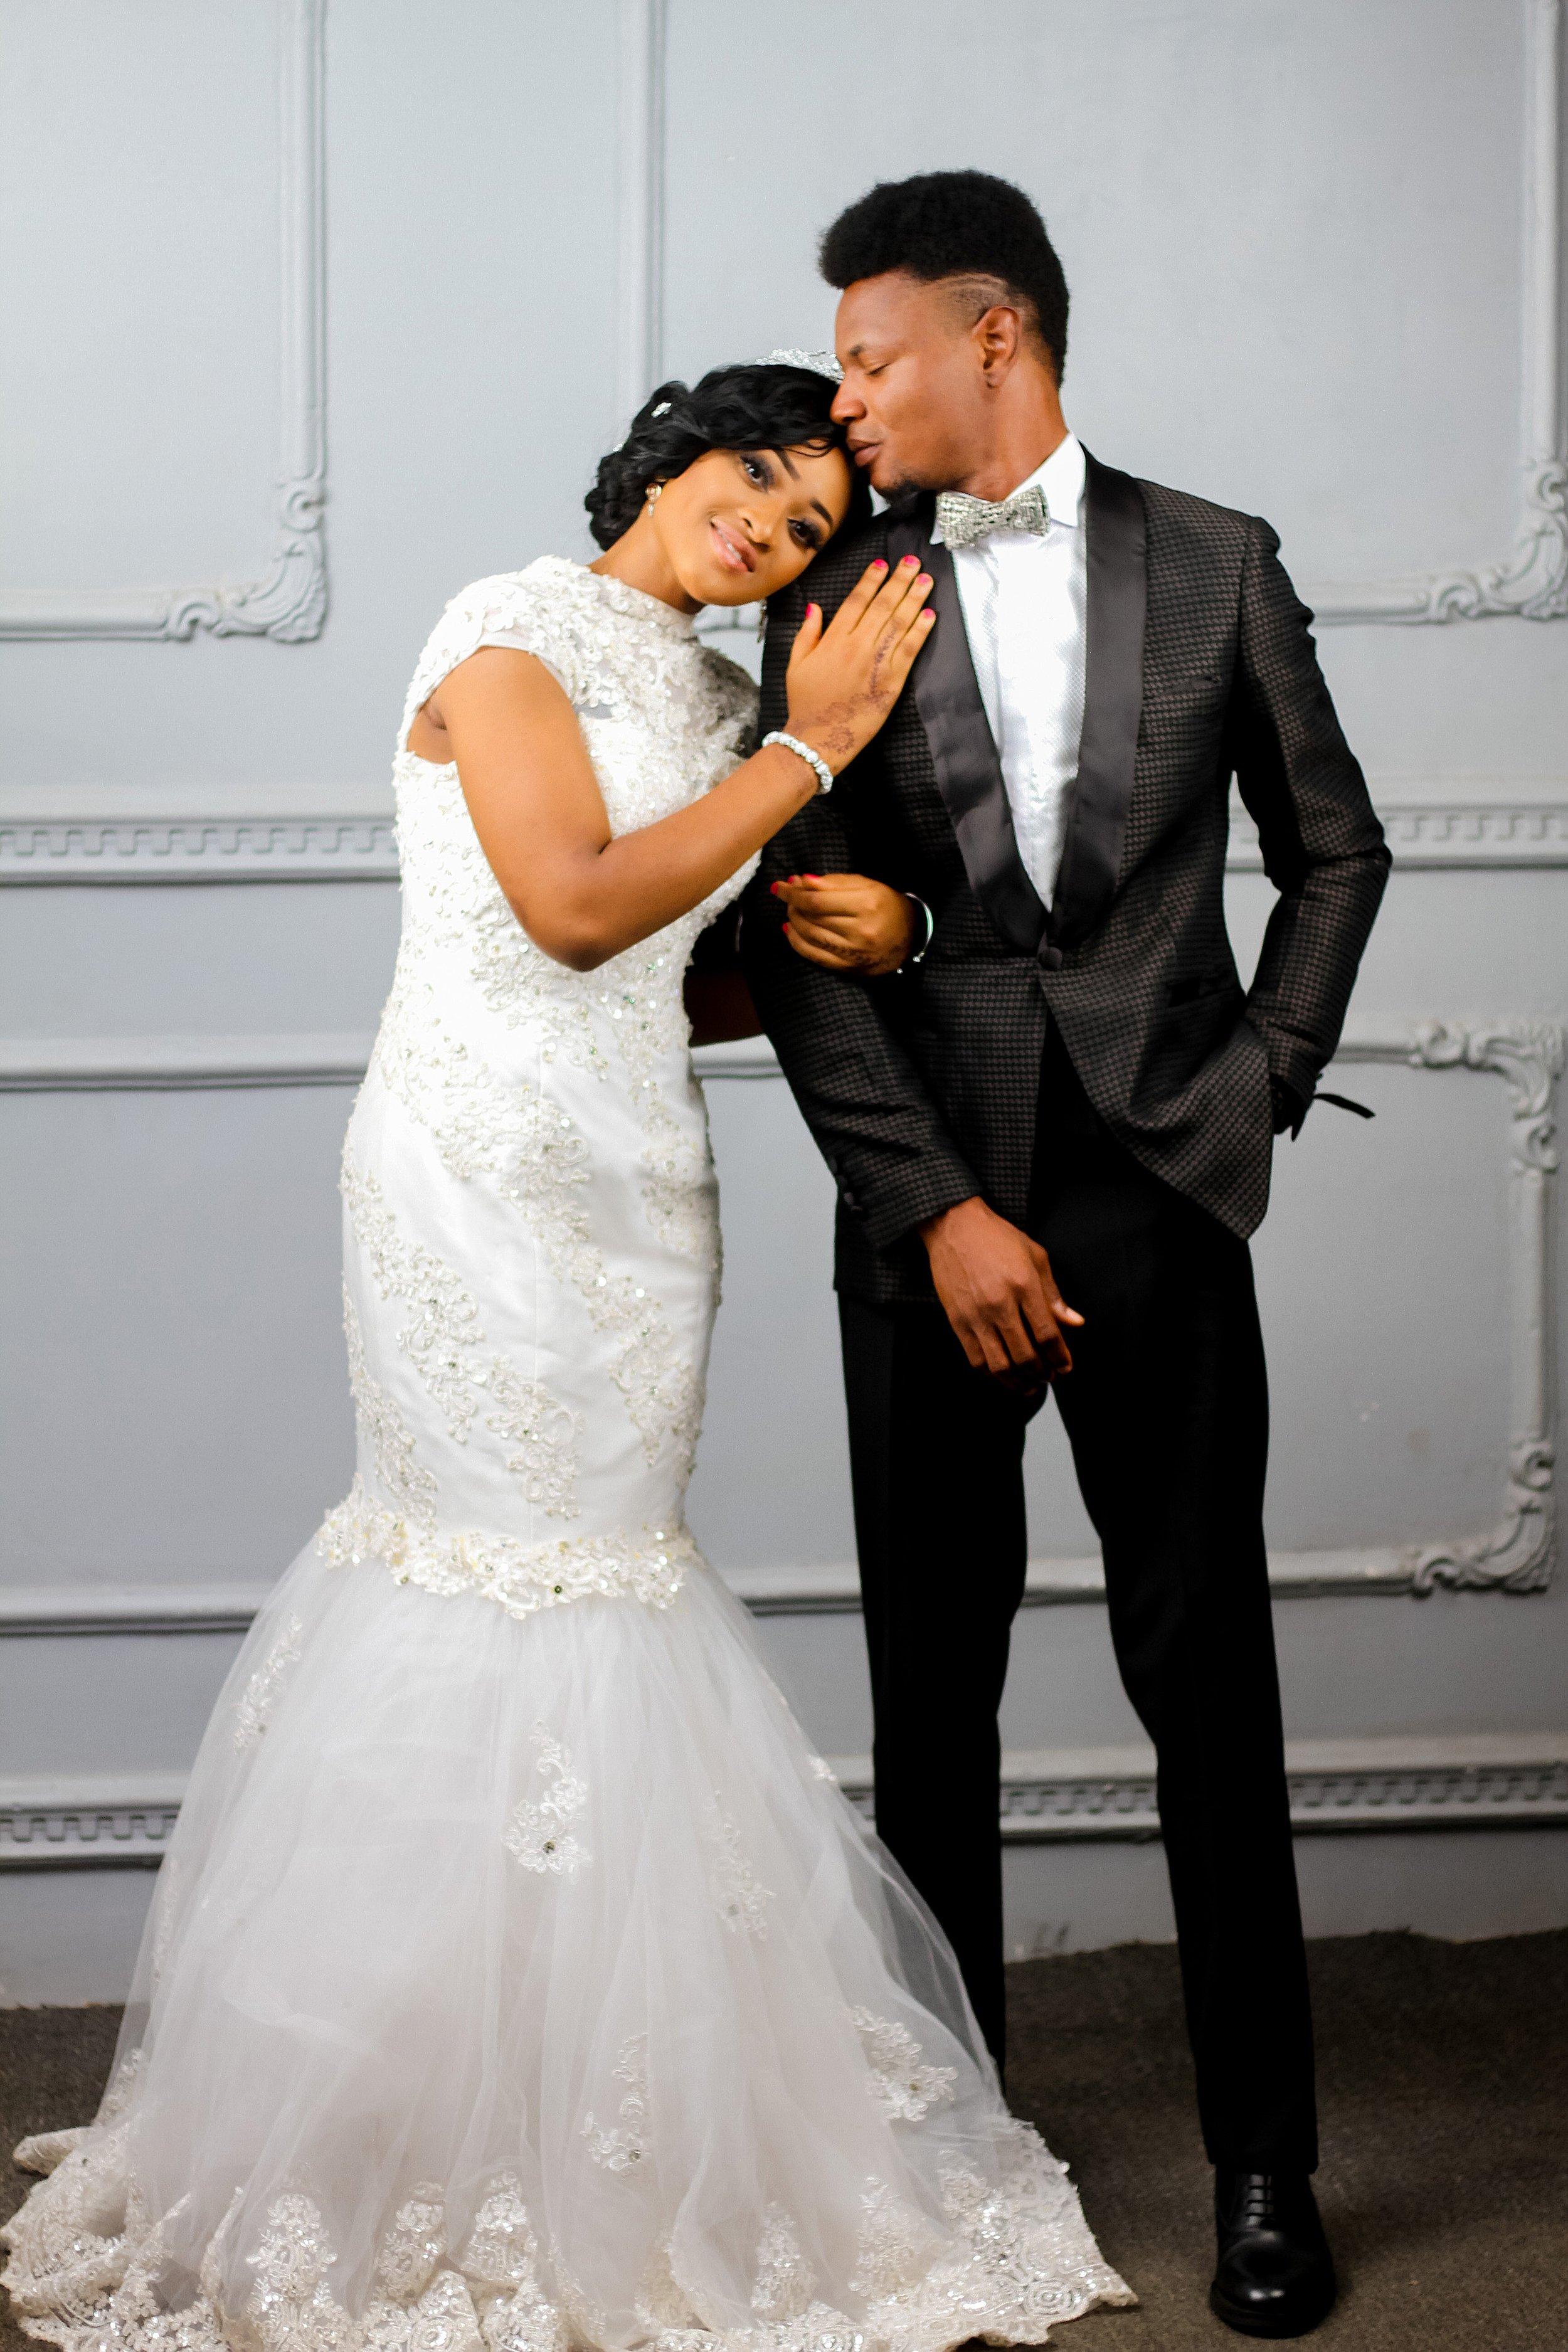 adults-bridal-bride-2062534.jpg